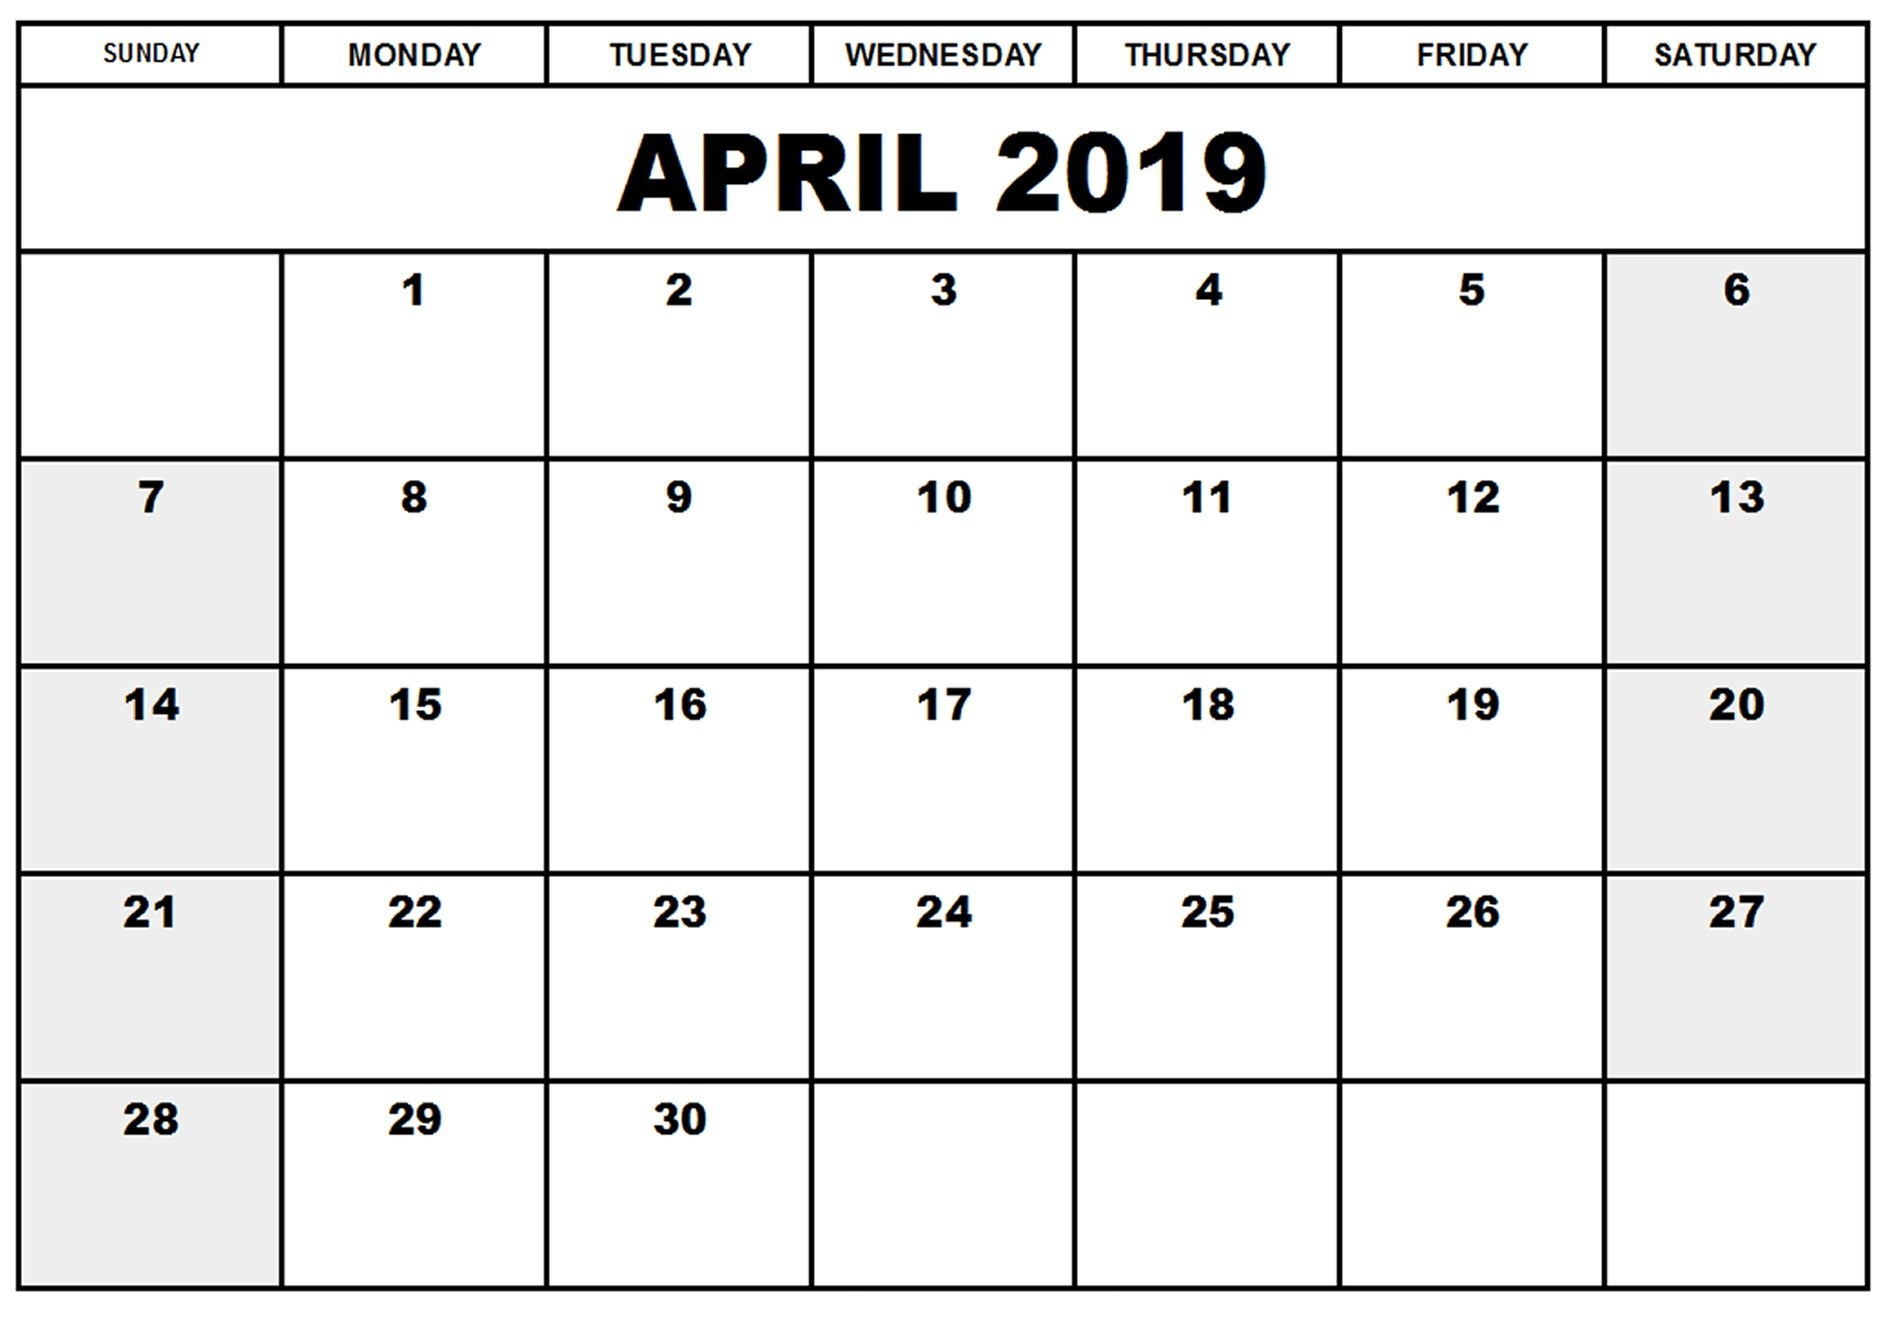 Free April 2019 Calendar Printable Blank Templates - Pdf Word within Nov Calendar Printable Template